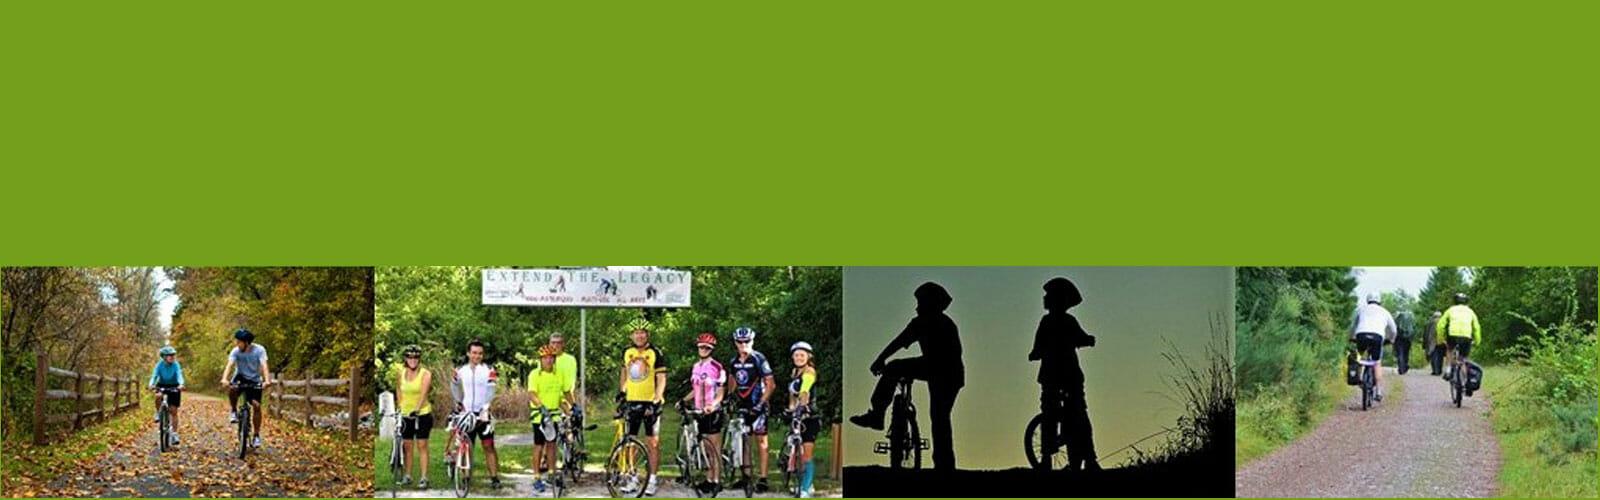 Friendship Trail page banner